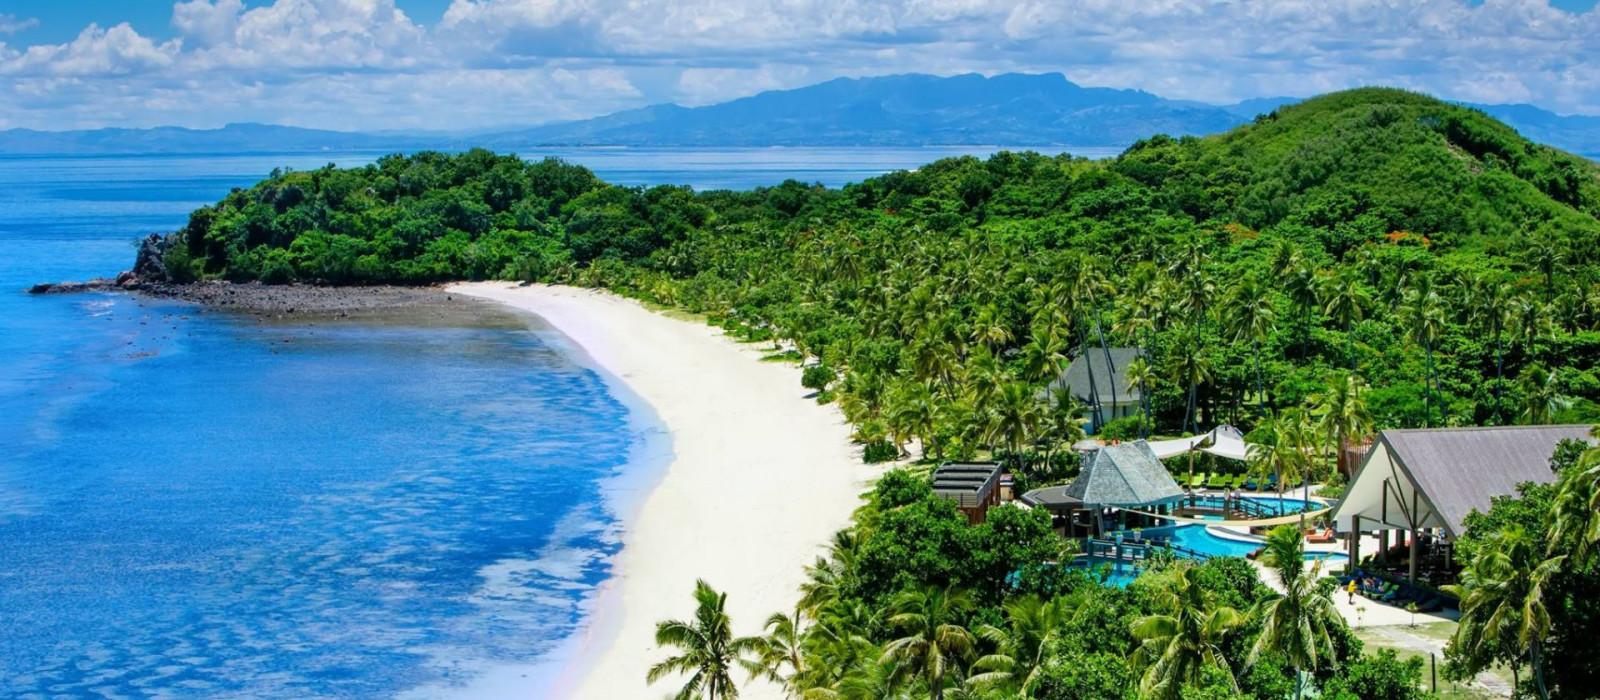 Destination Mamanuca Islands Fiji